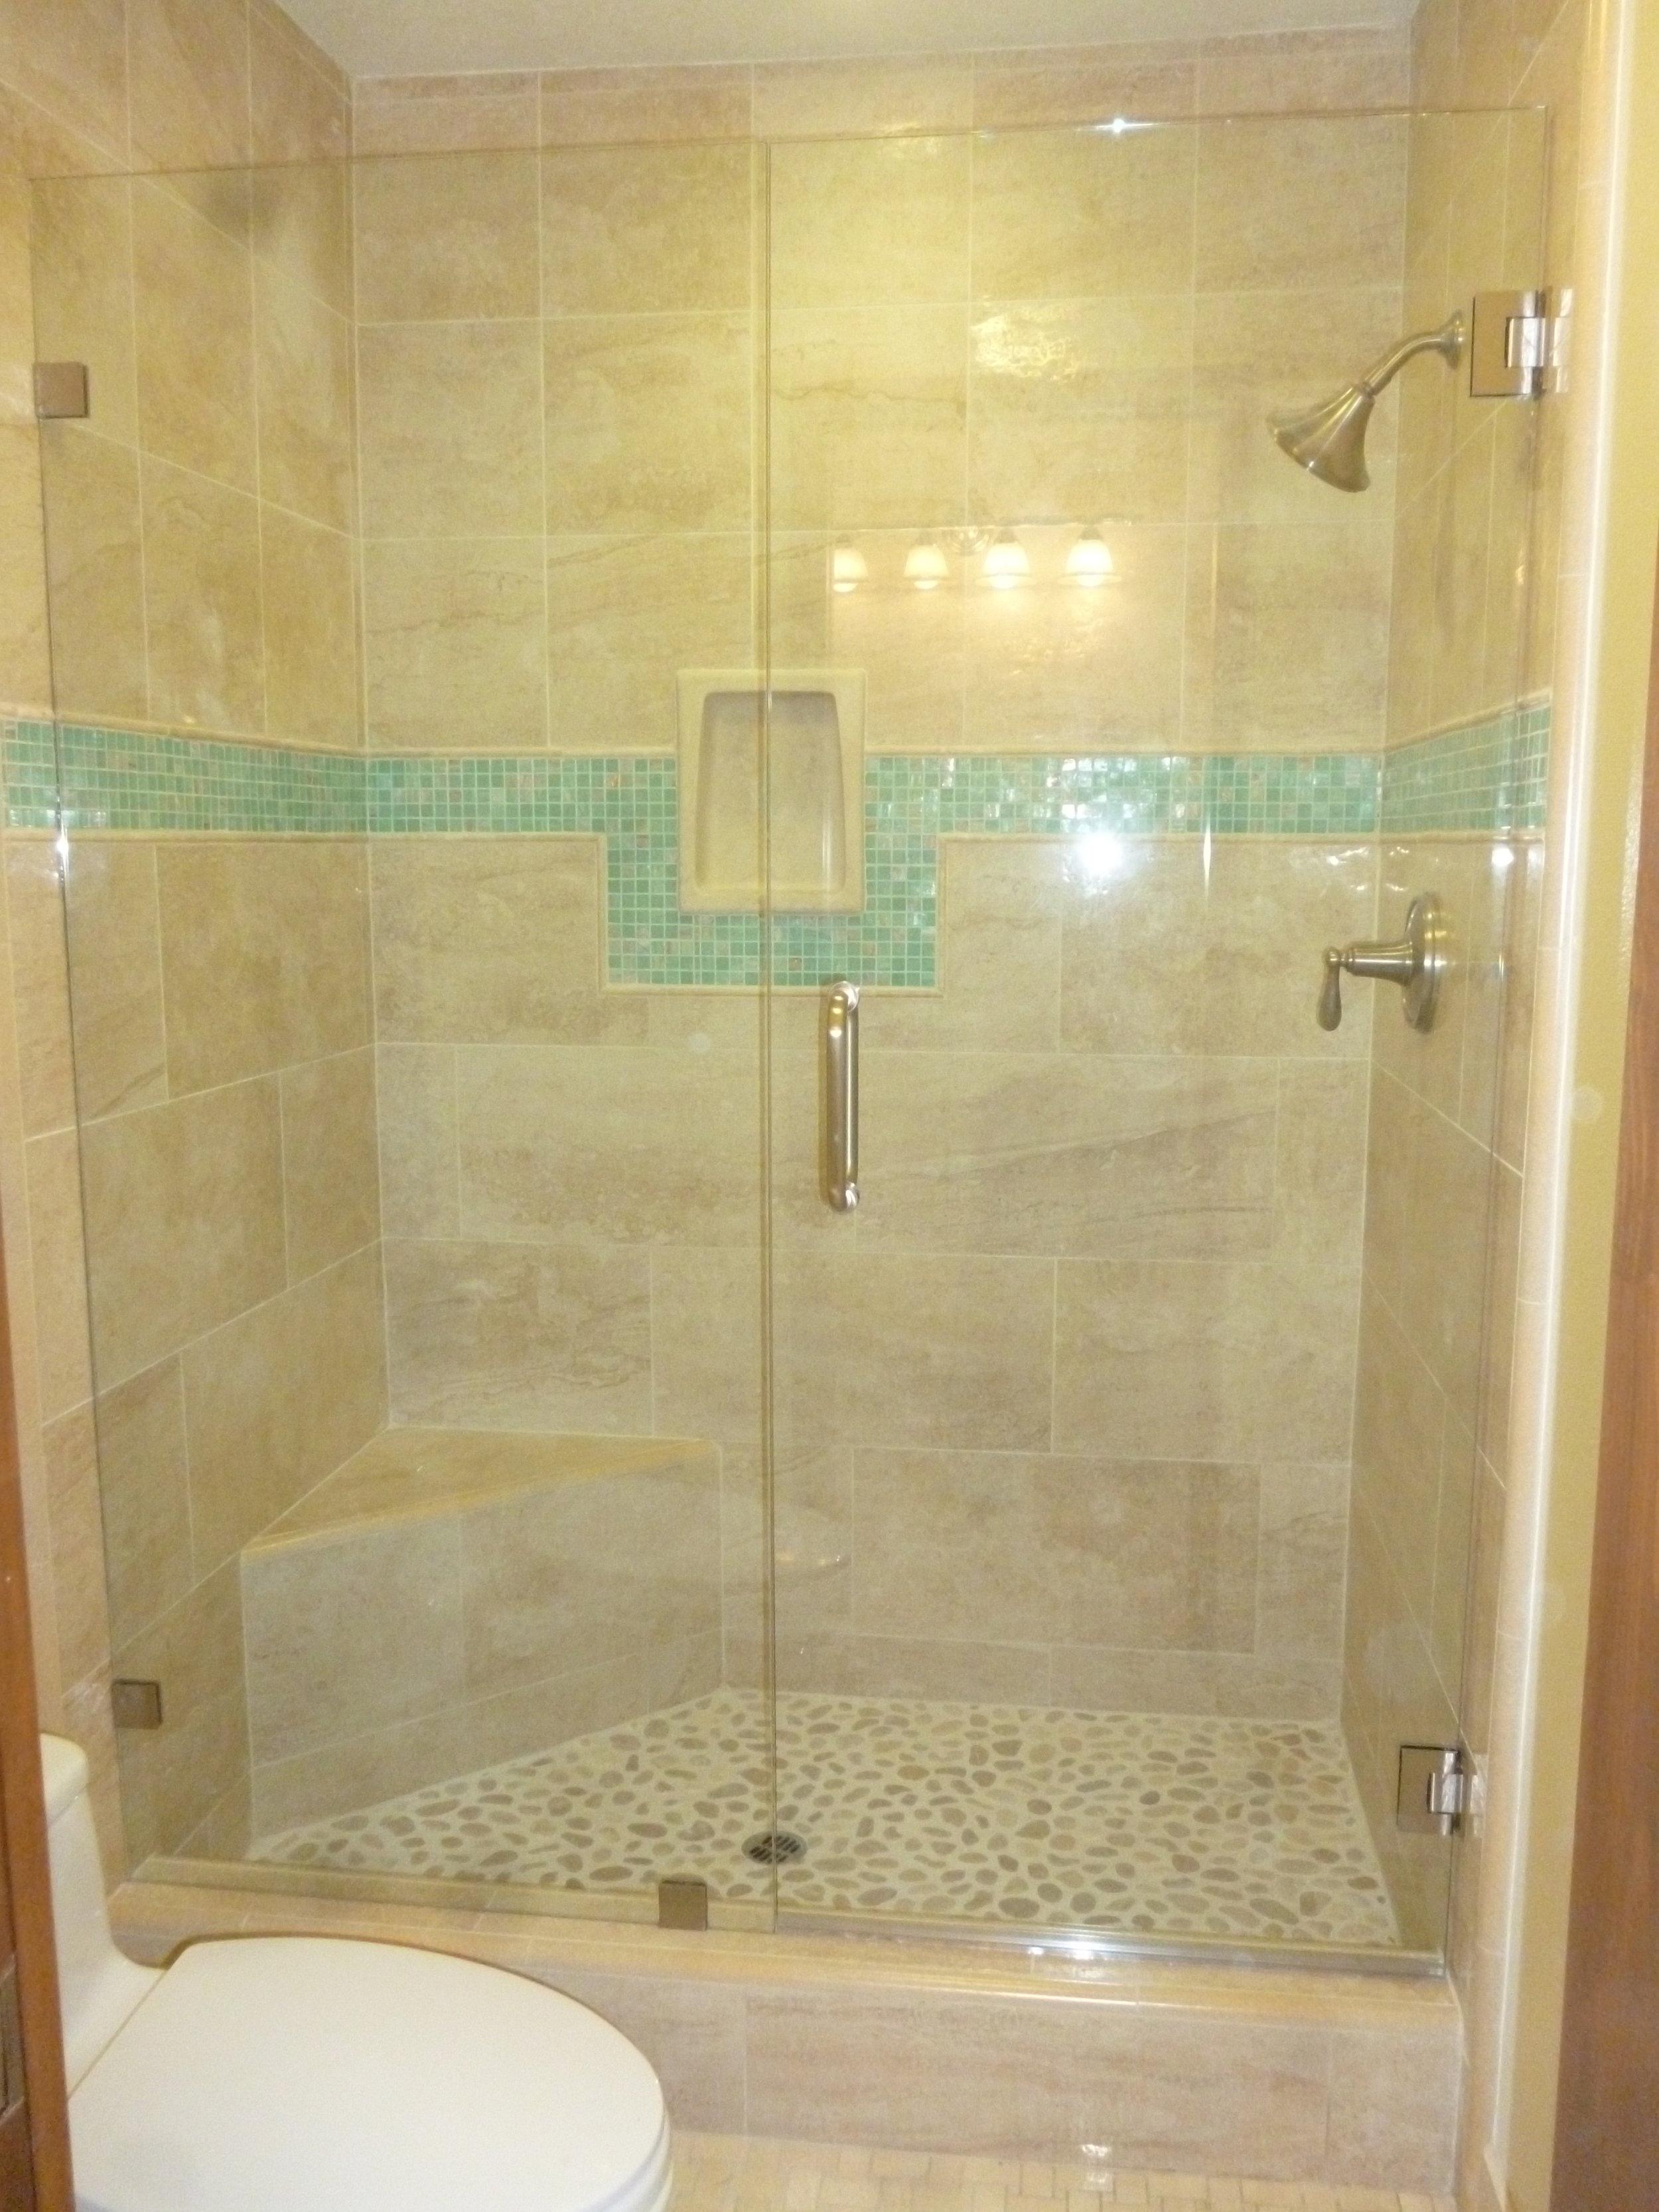 Shower-Doors-Residential-Photos-9.jpg